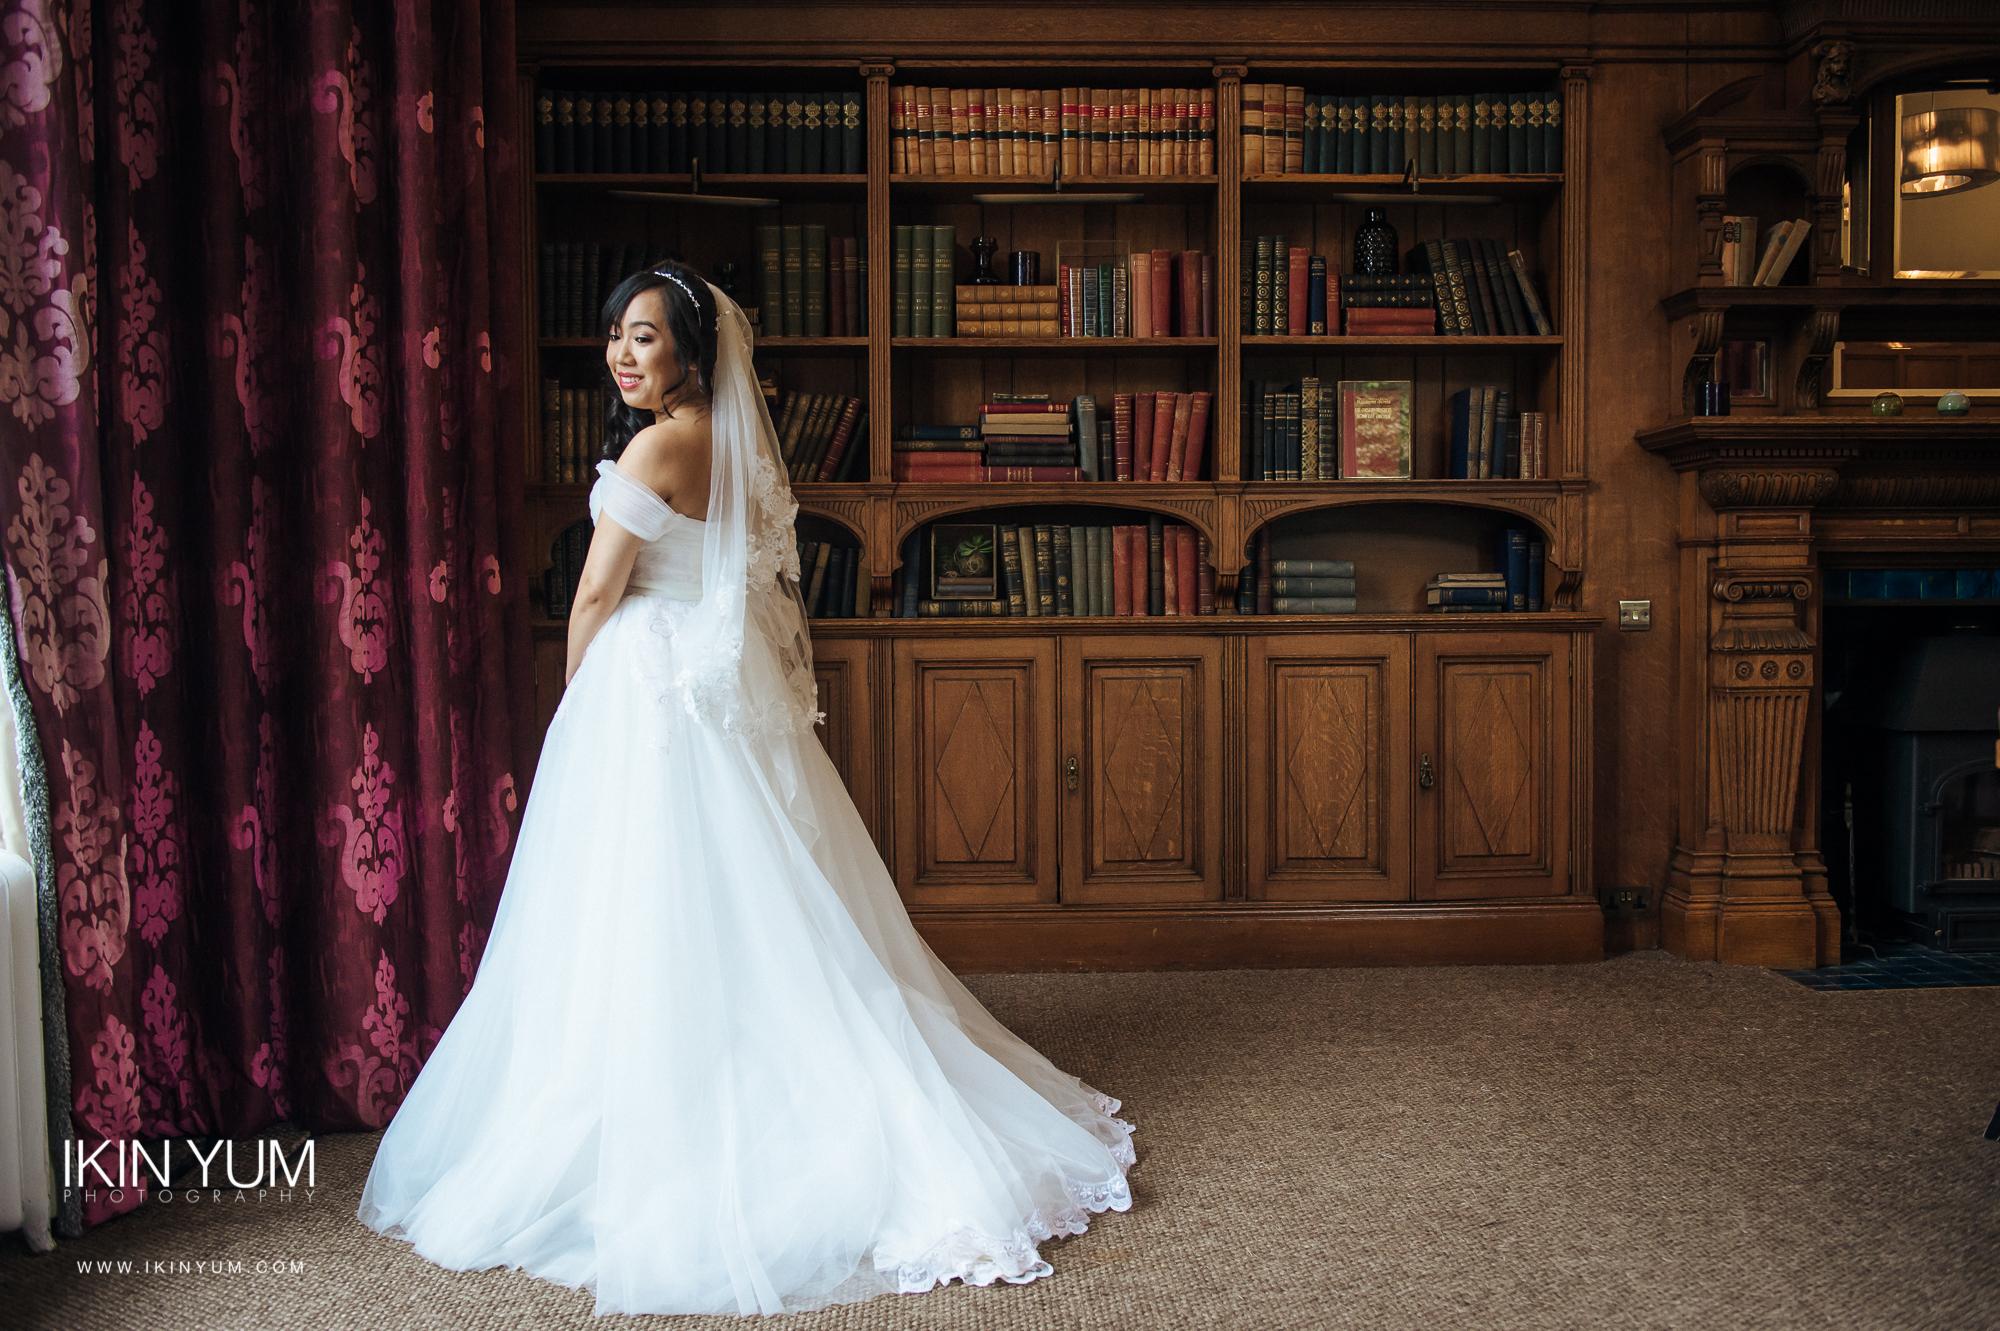 Hampton Manor Wedding - Ikin Yum Photography -059.jpg